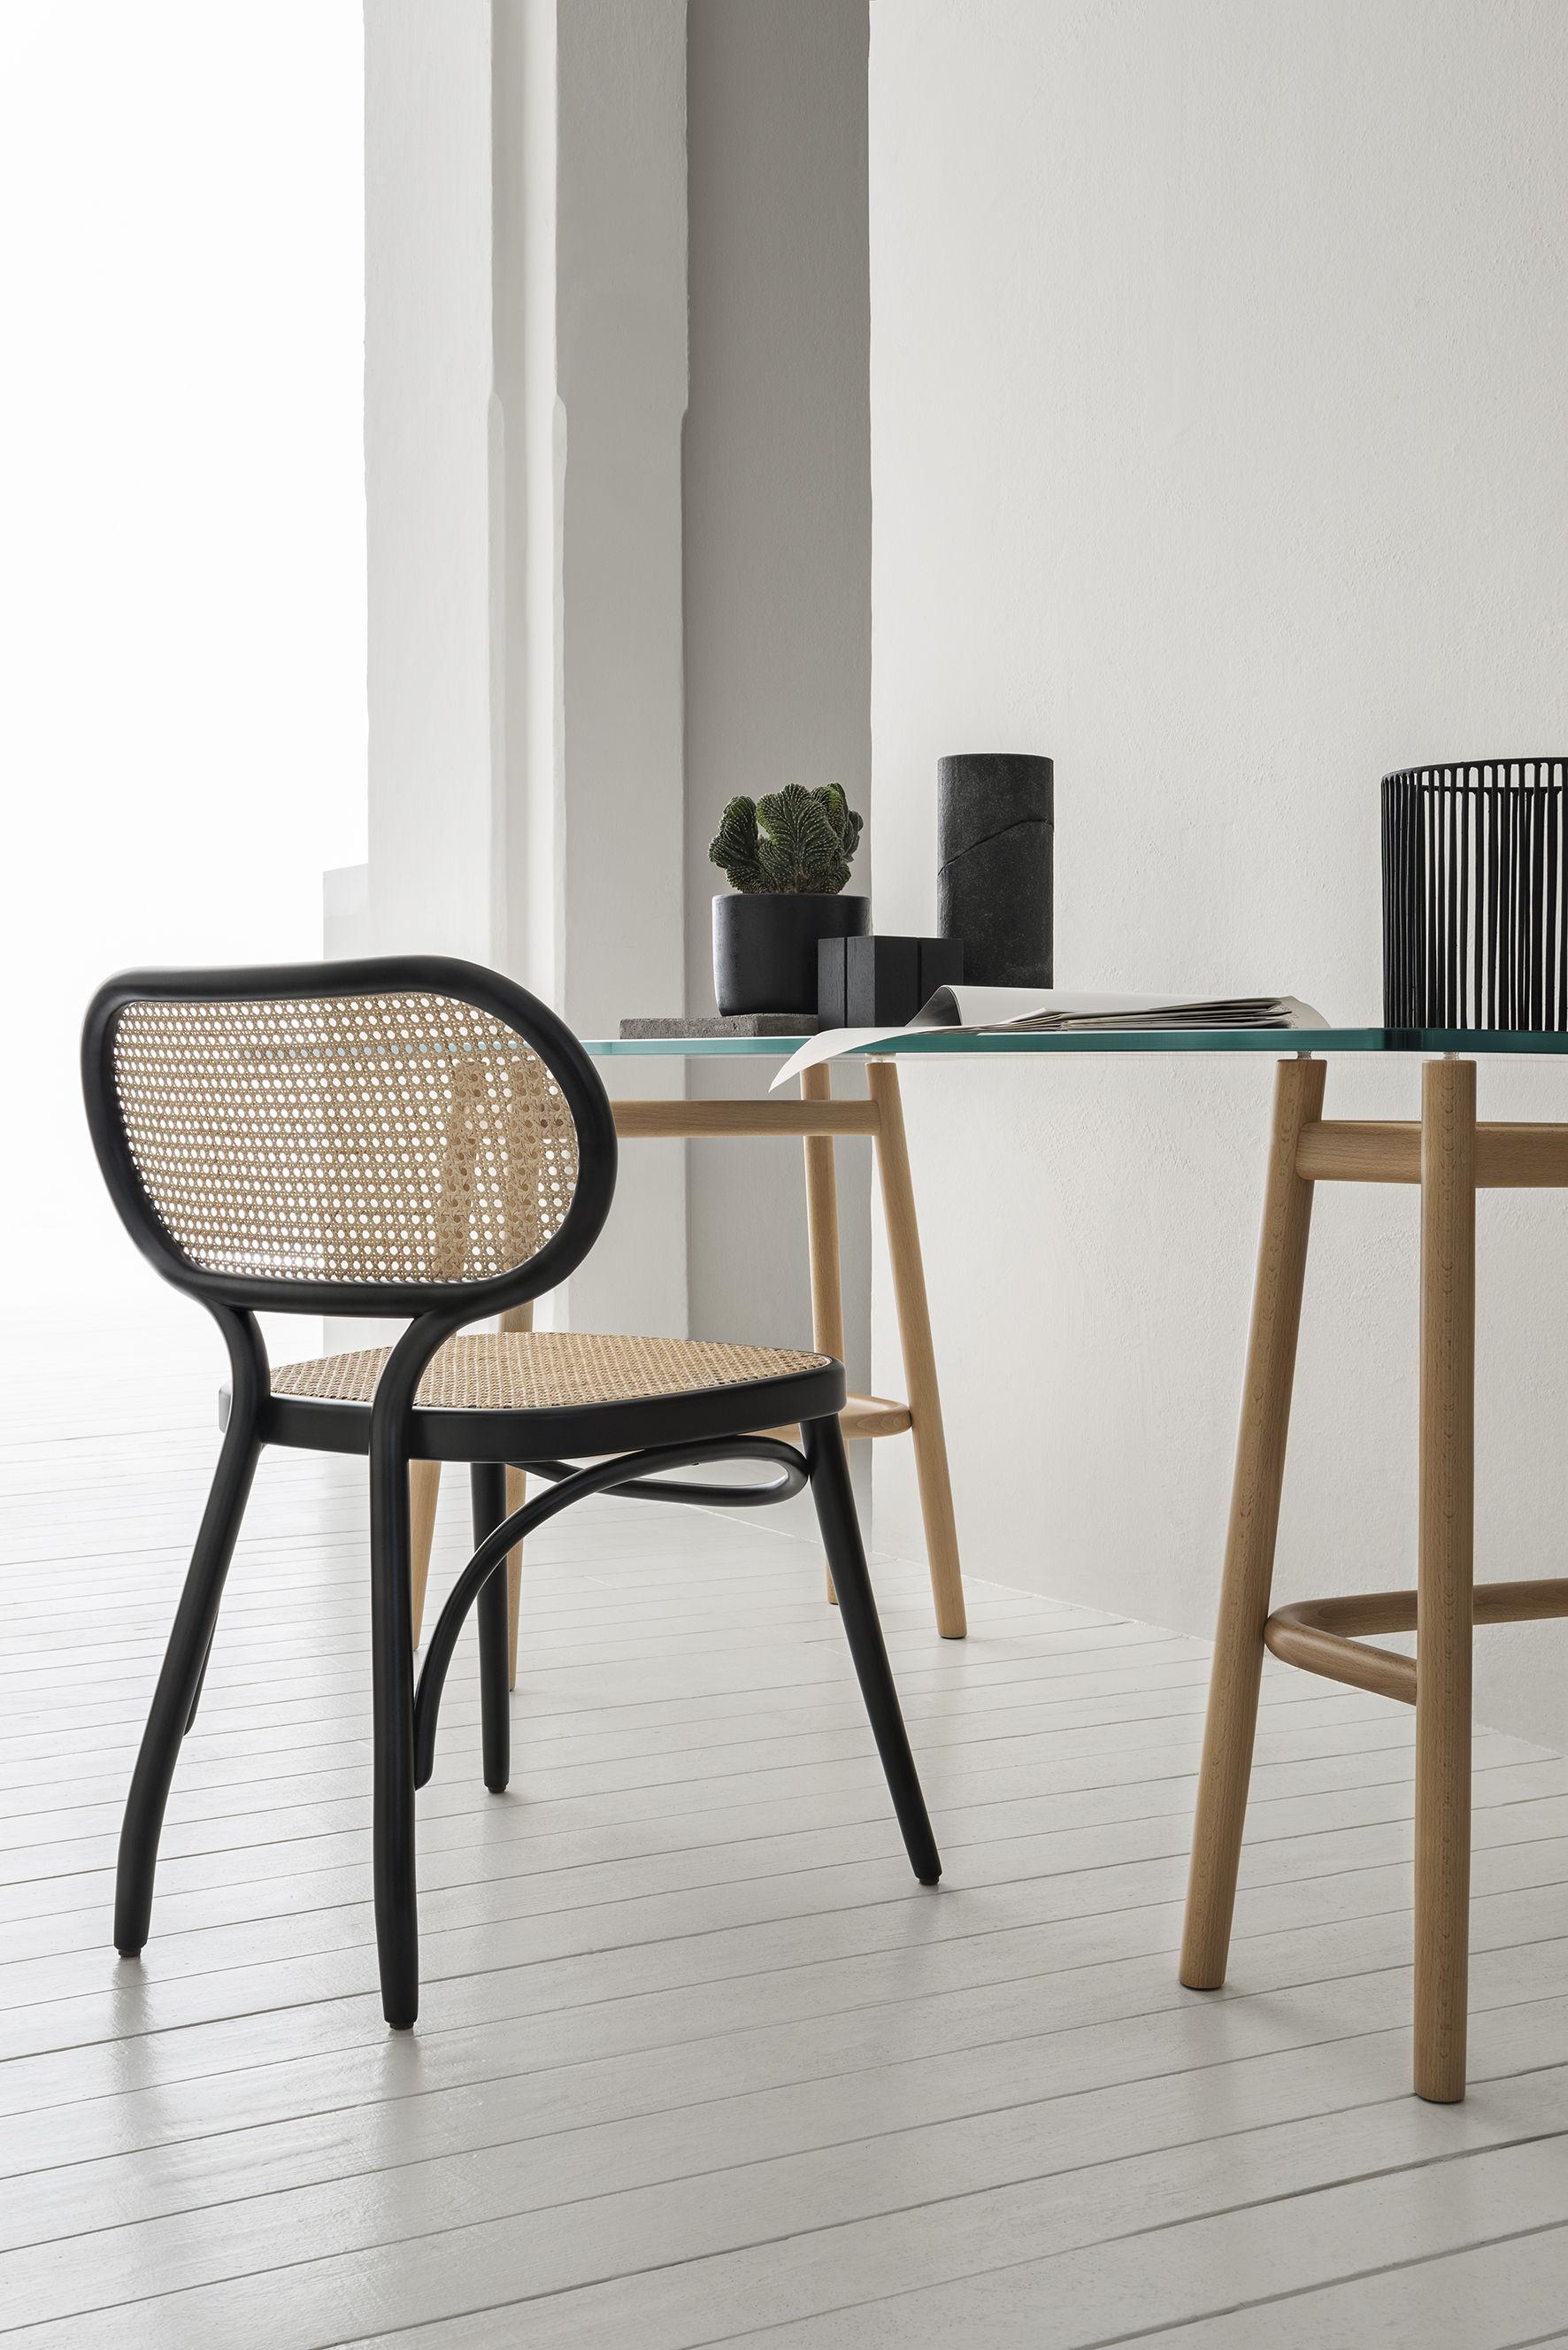 chaise bodystuhl bois cannage blanc paille naturelle wiener gtv design. Black Bedroom Furniture Sets. Home Design Ideas